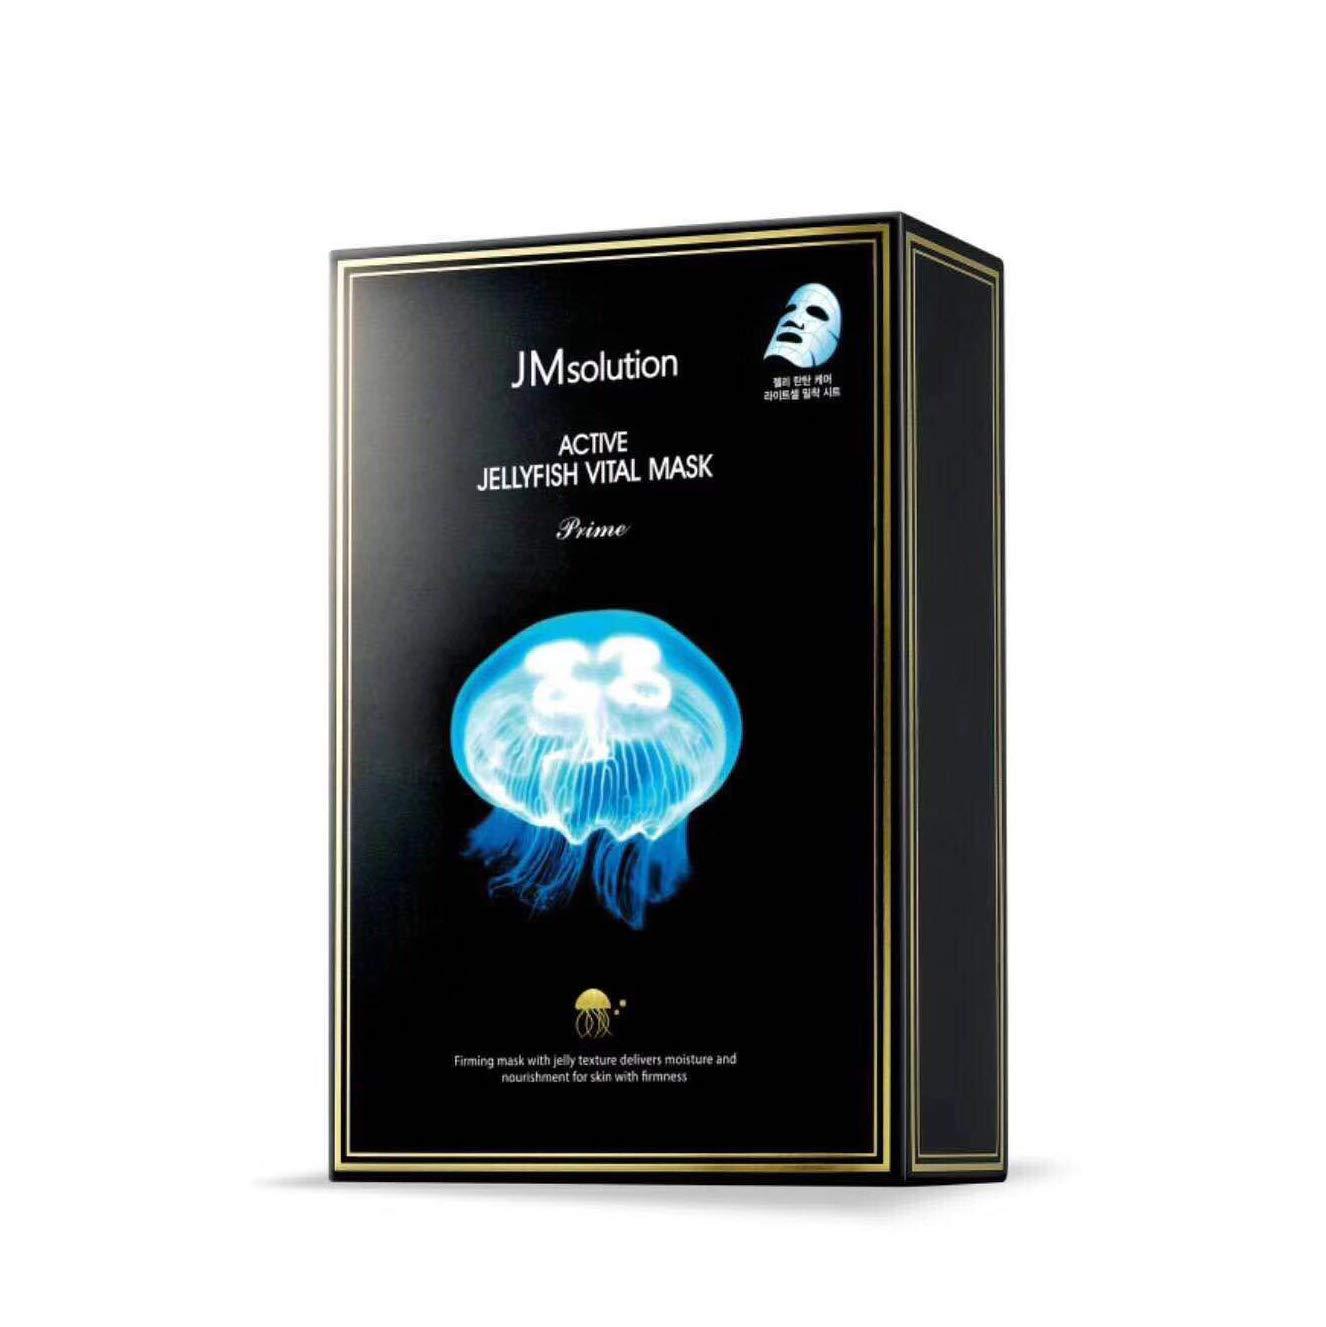 JM SOLUTION Active Jellyfish Vital Mask (10pcs)